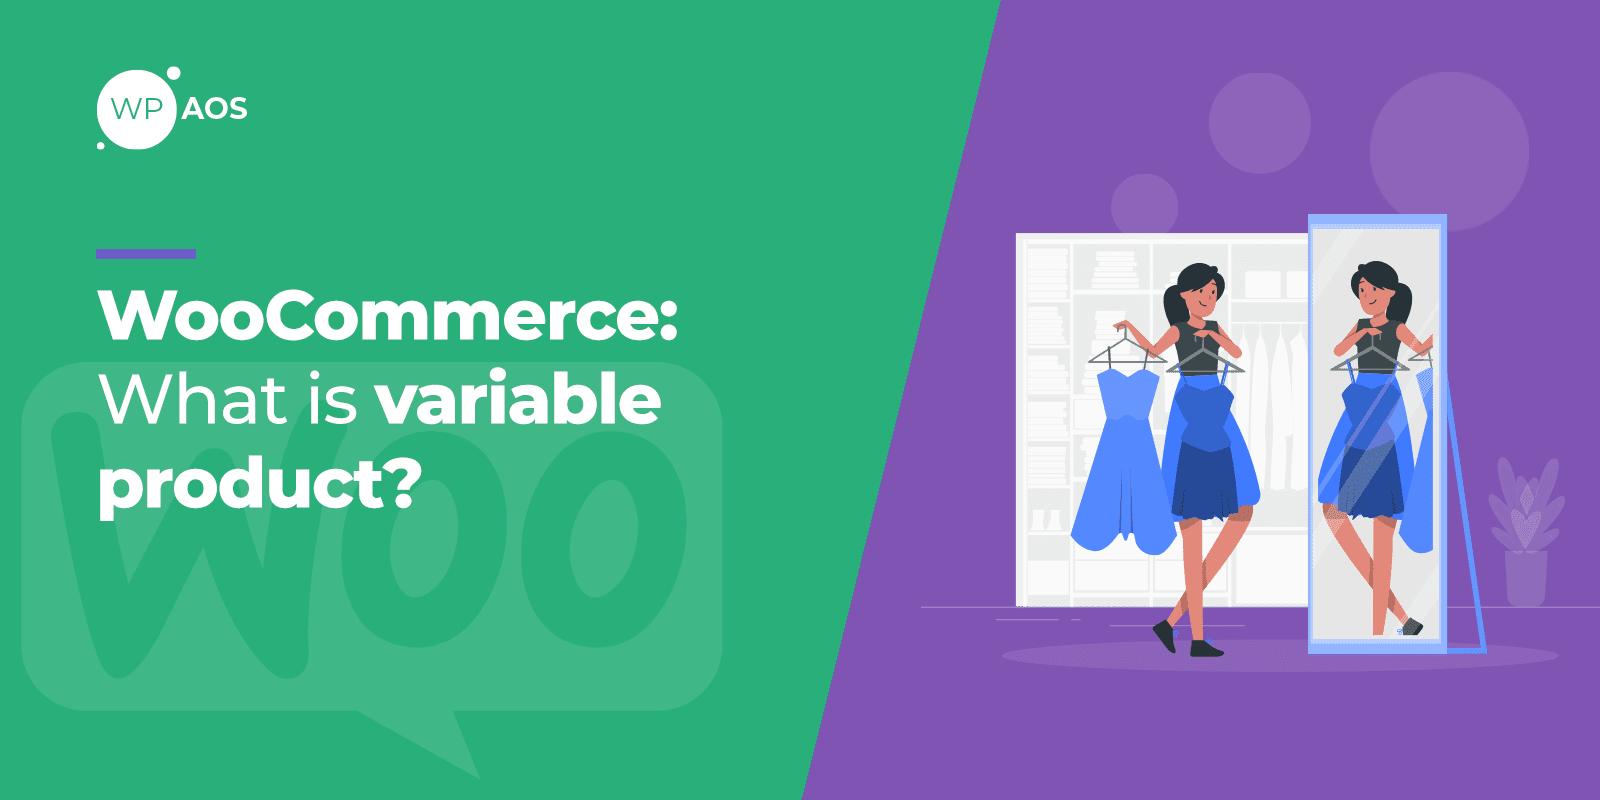 WooCommerce Variable Product, WordPress Maintenance, wpaos